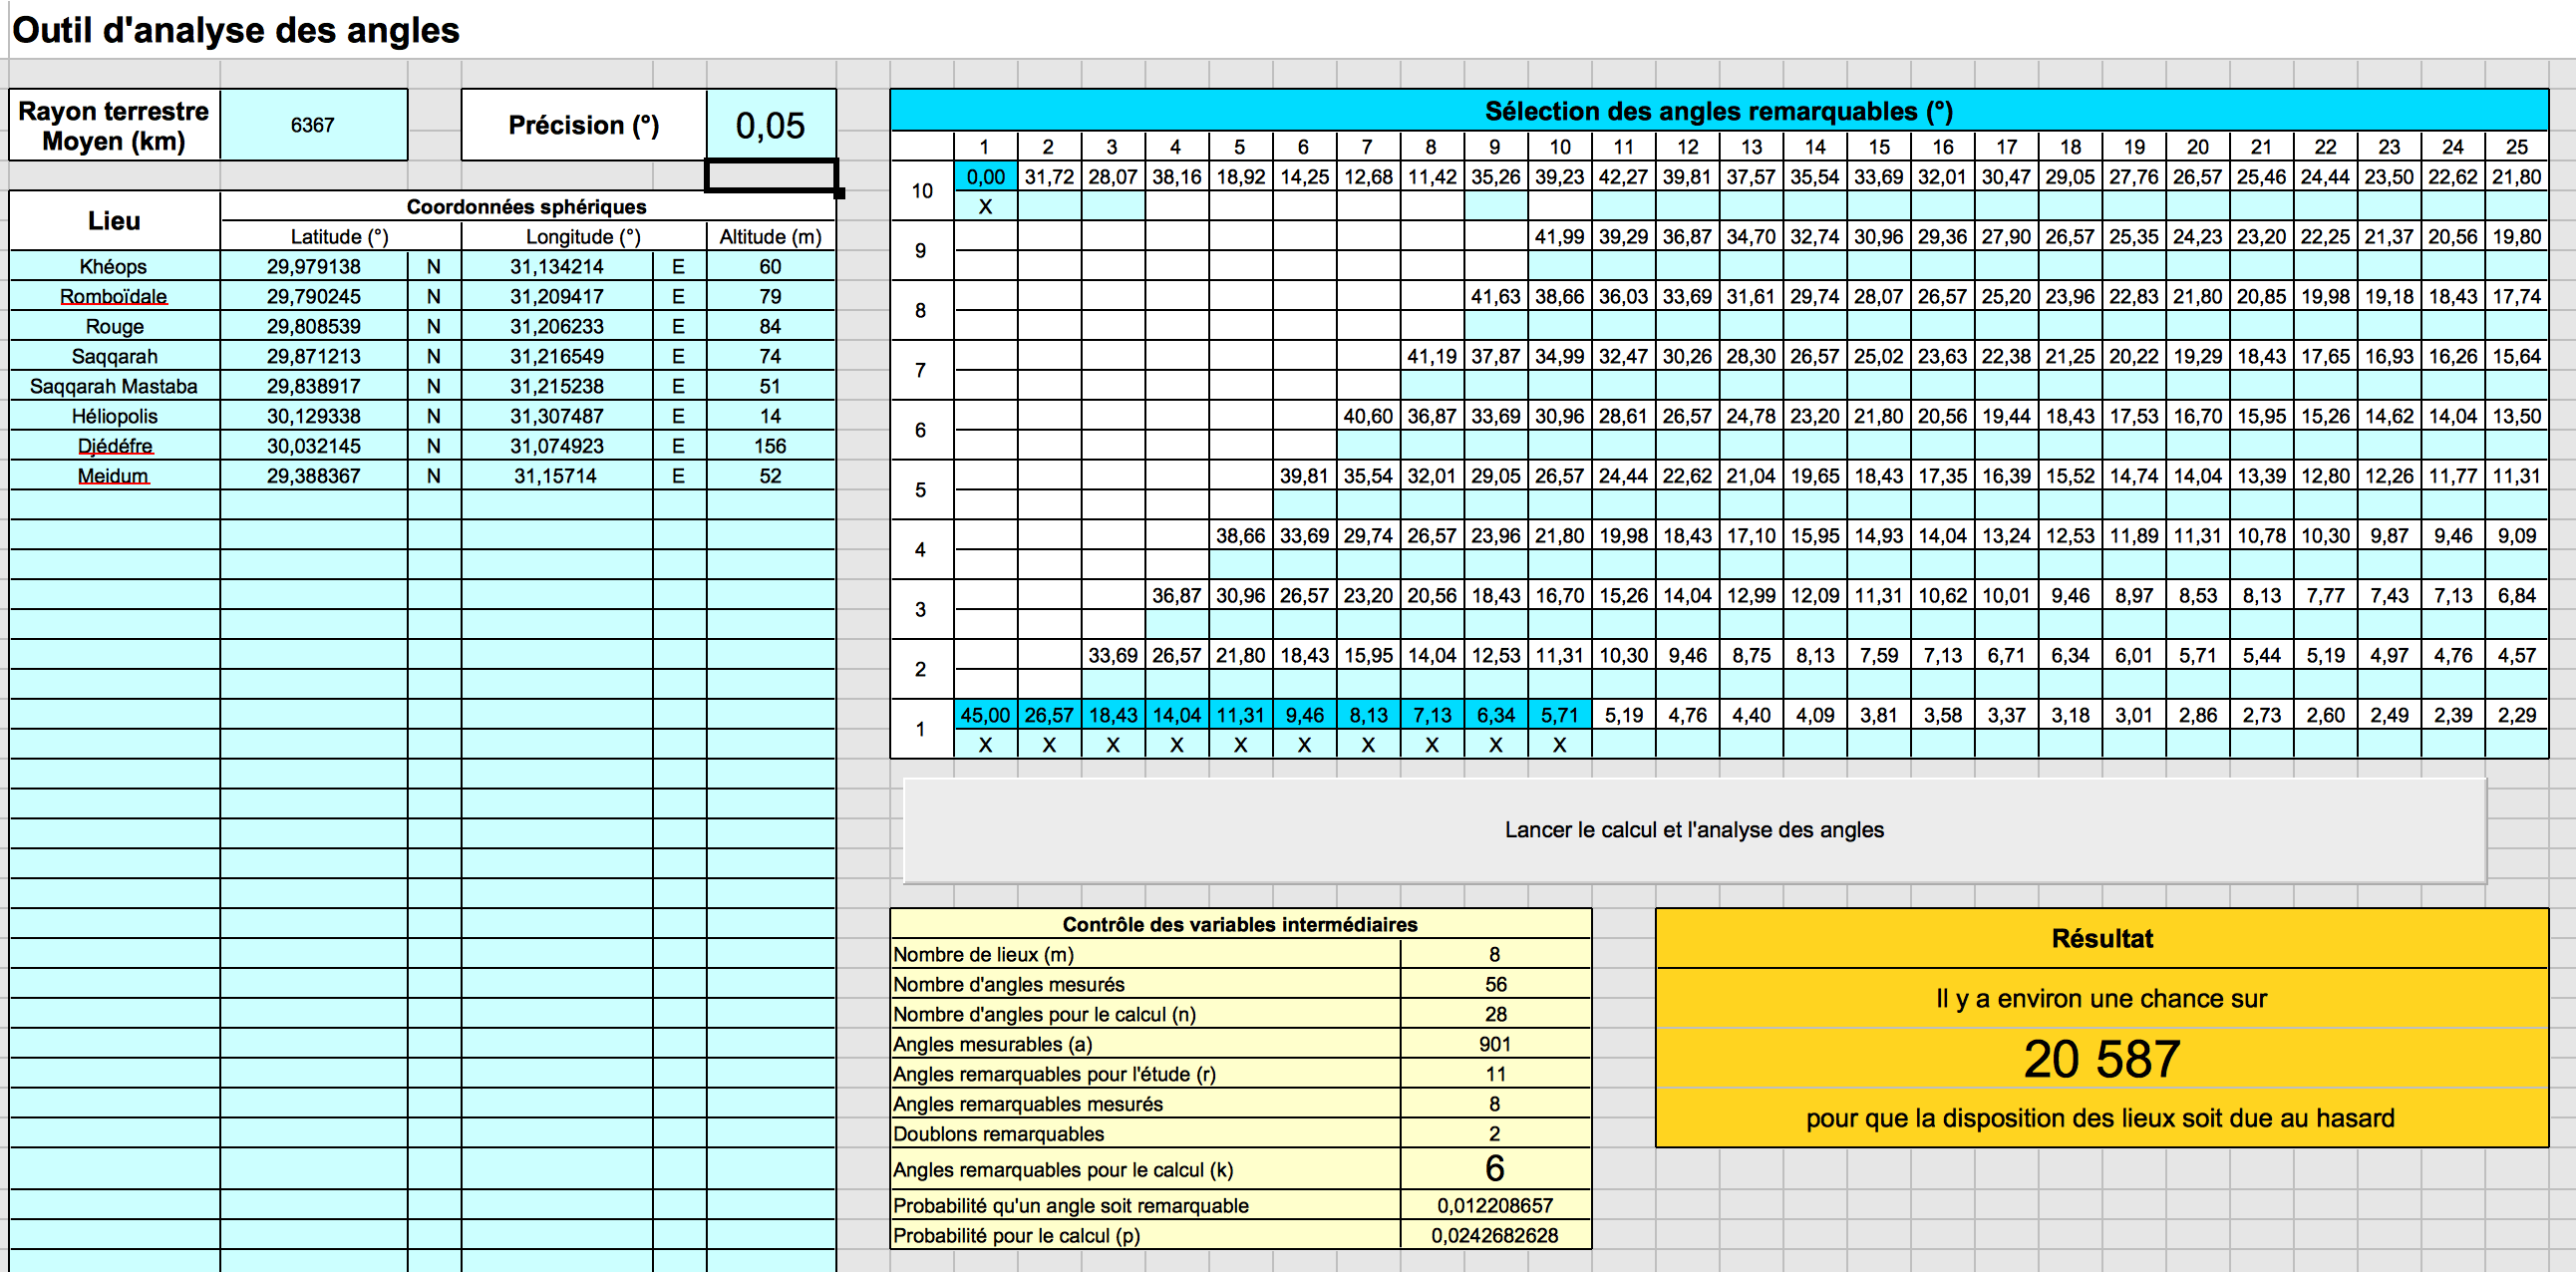 2017-11-16 09:12:11